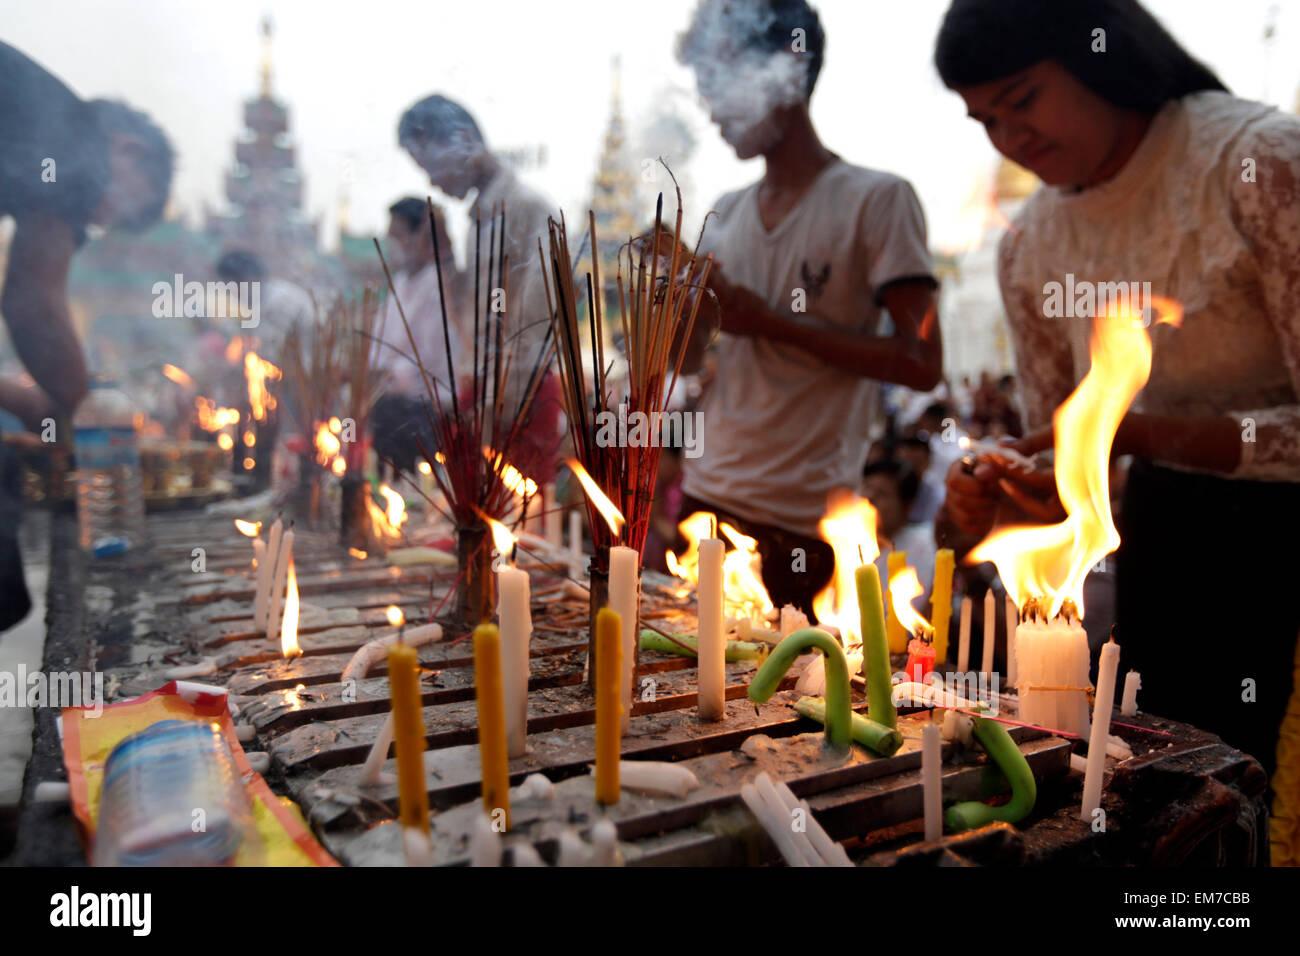 Yangon, Myanmar  17th Apr, 2015  People light candles and burn Stock